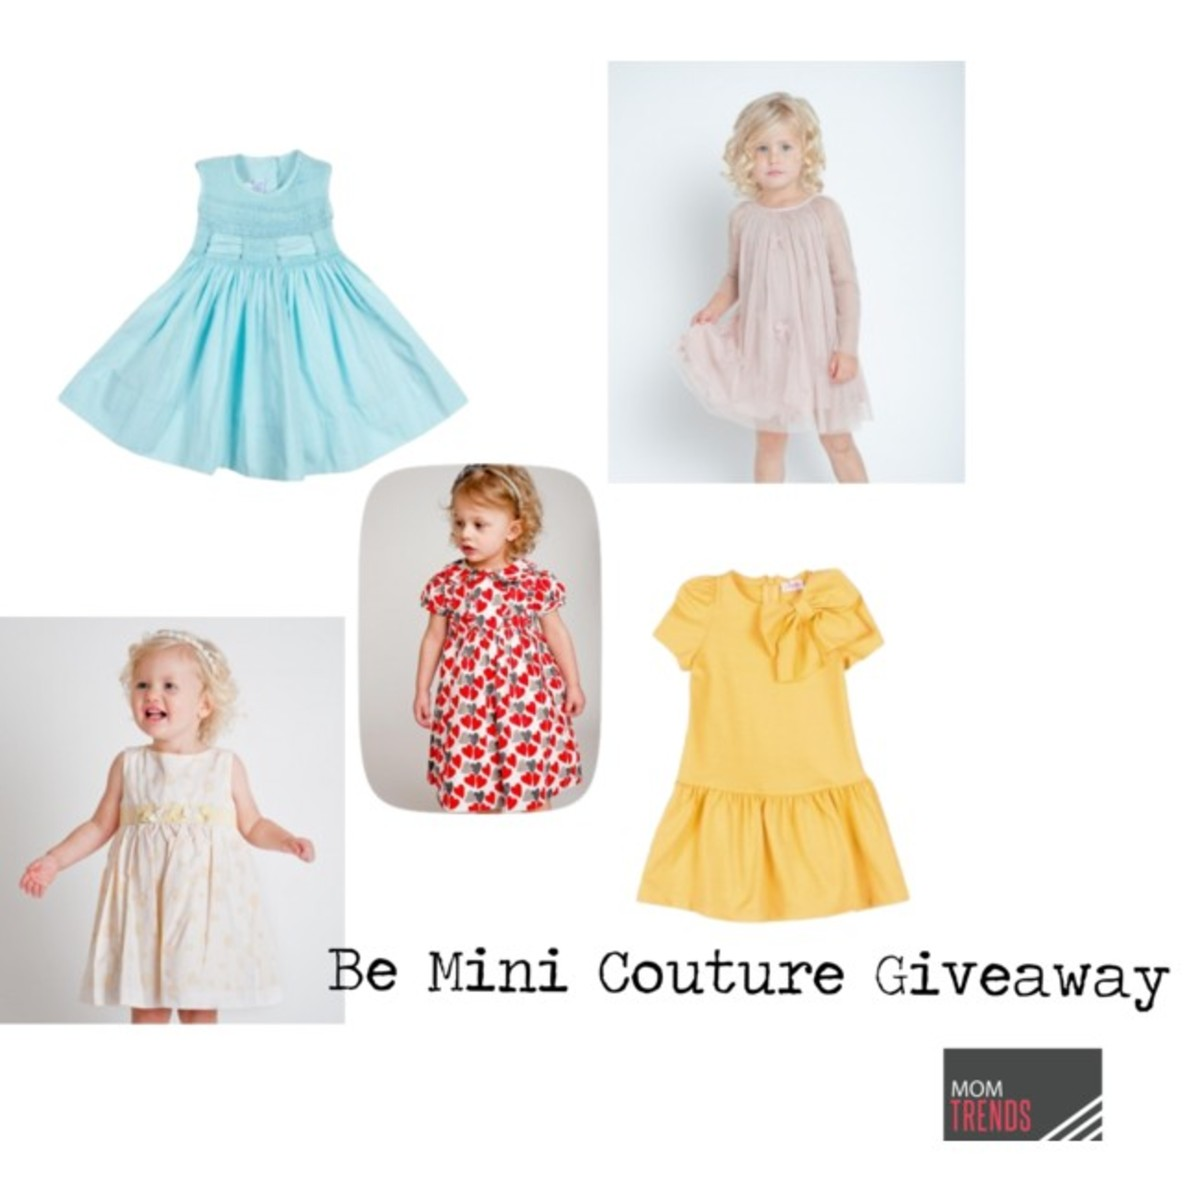 be mini couture